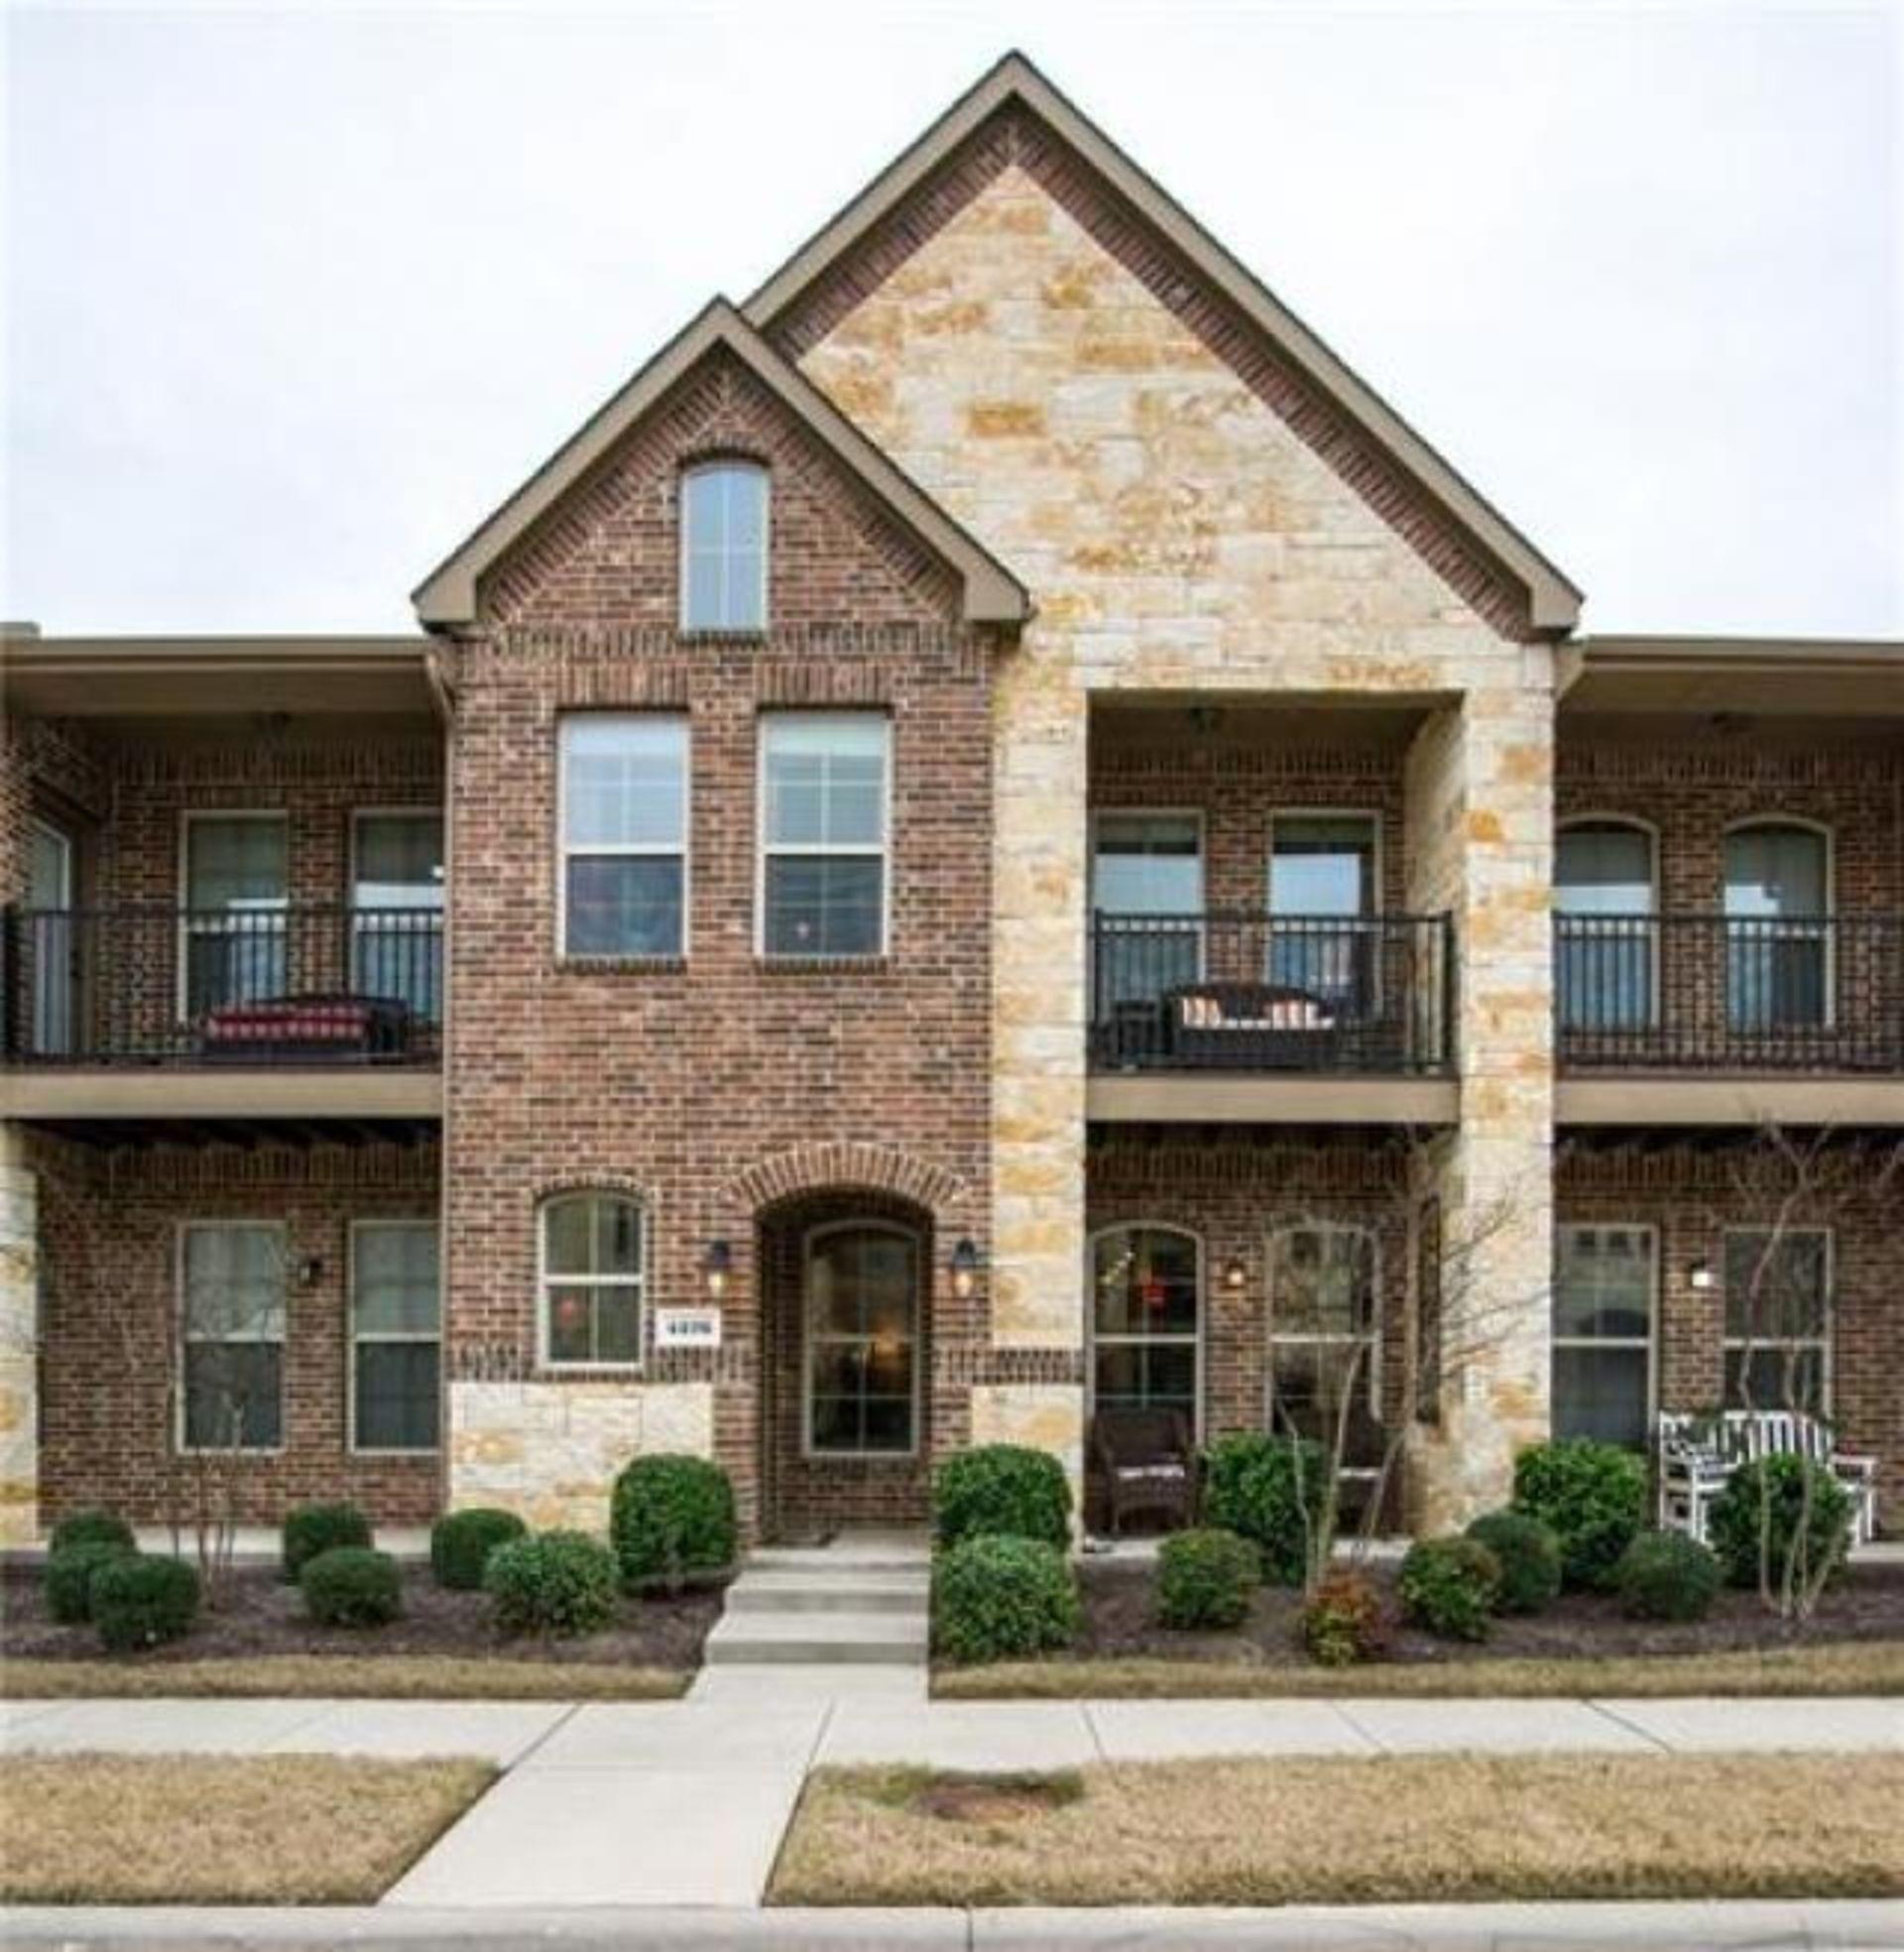 For Sale! 4276 Kiowa Drive, Carrollton, TX